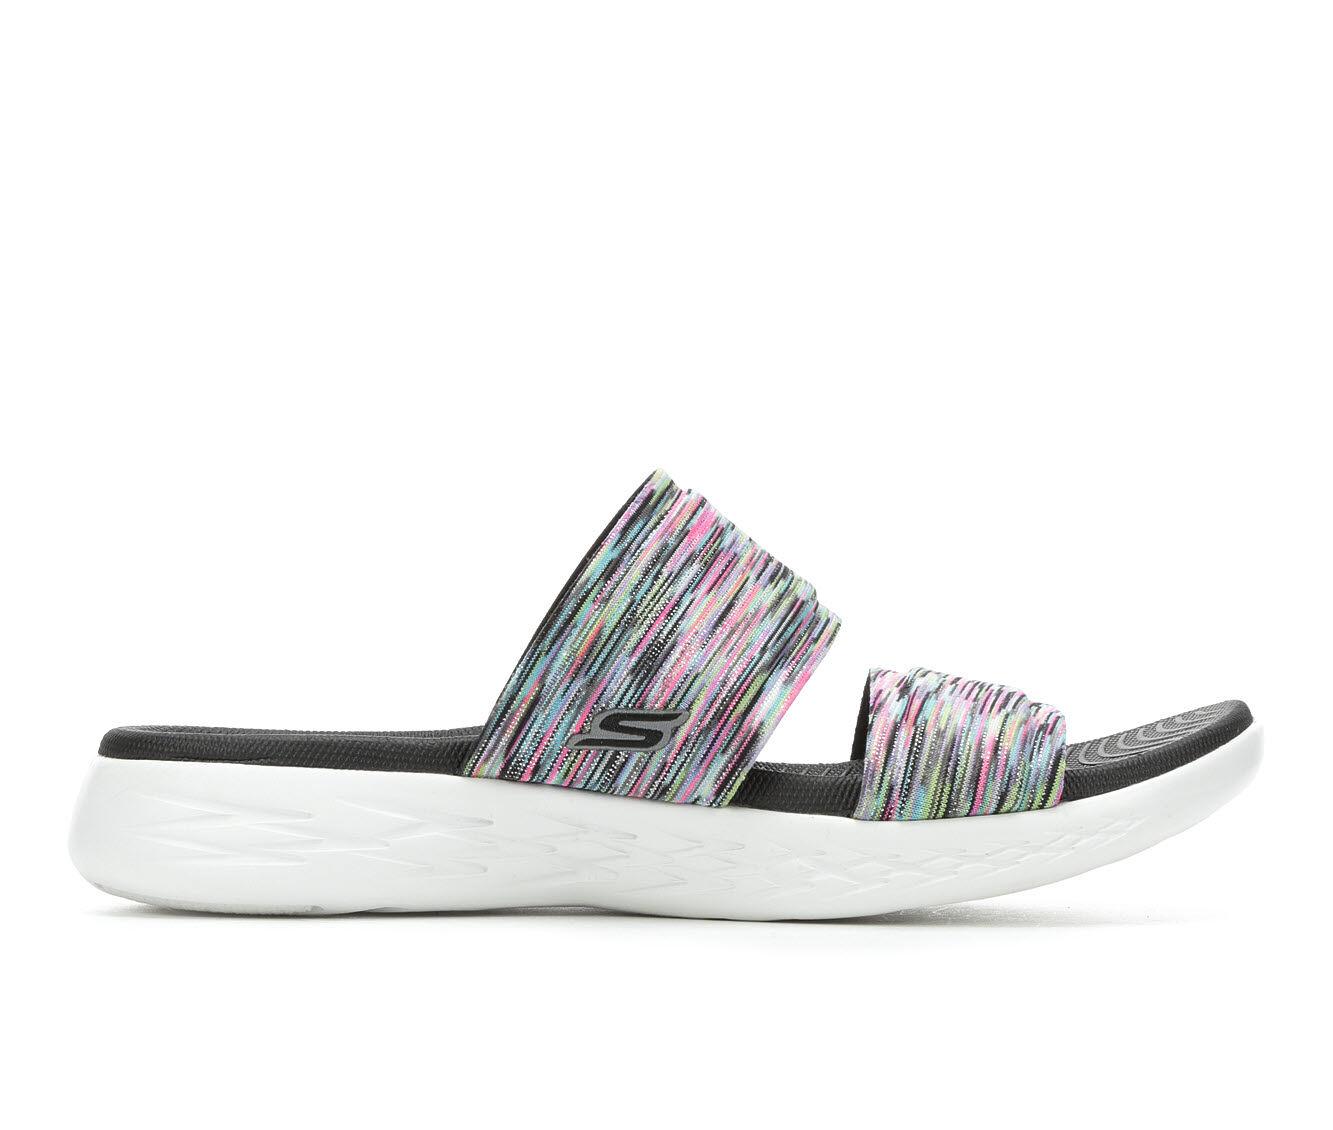 uk shoes_kd3618